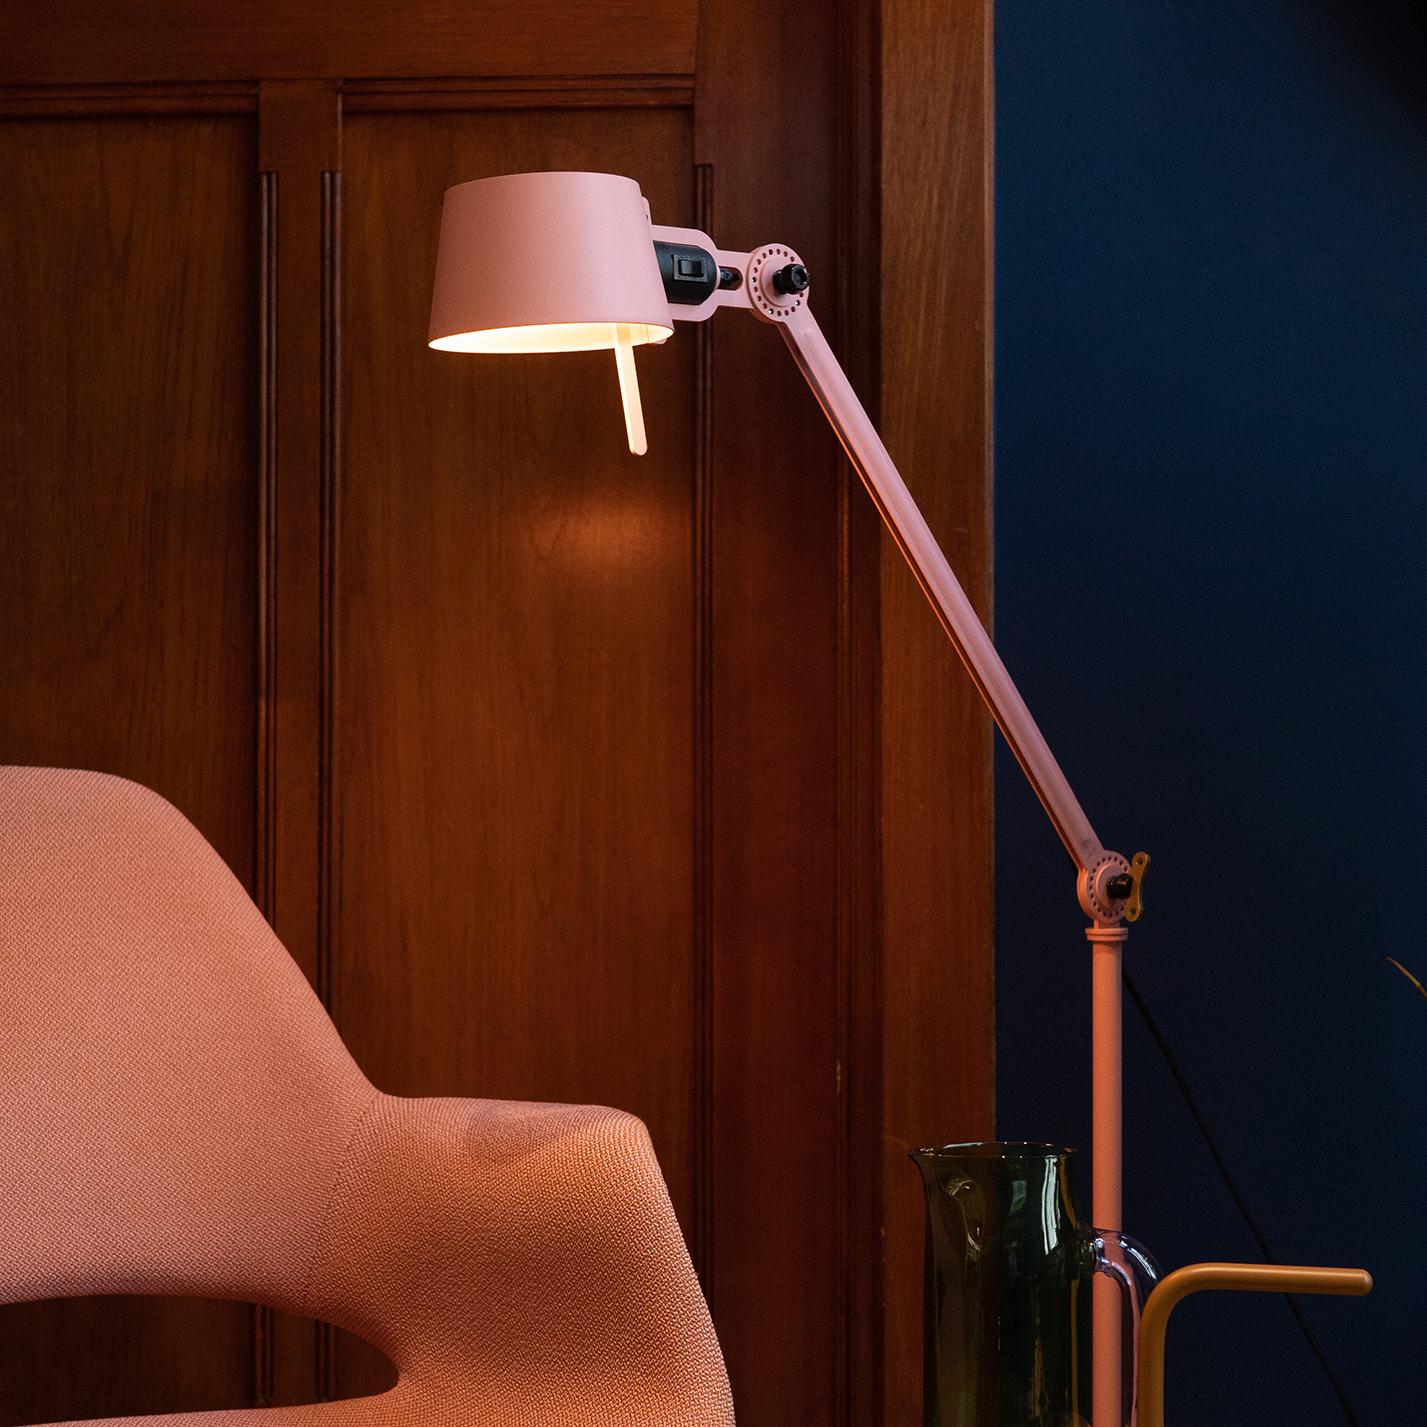 Tonone Bolt floor lamp daybreak rose